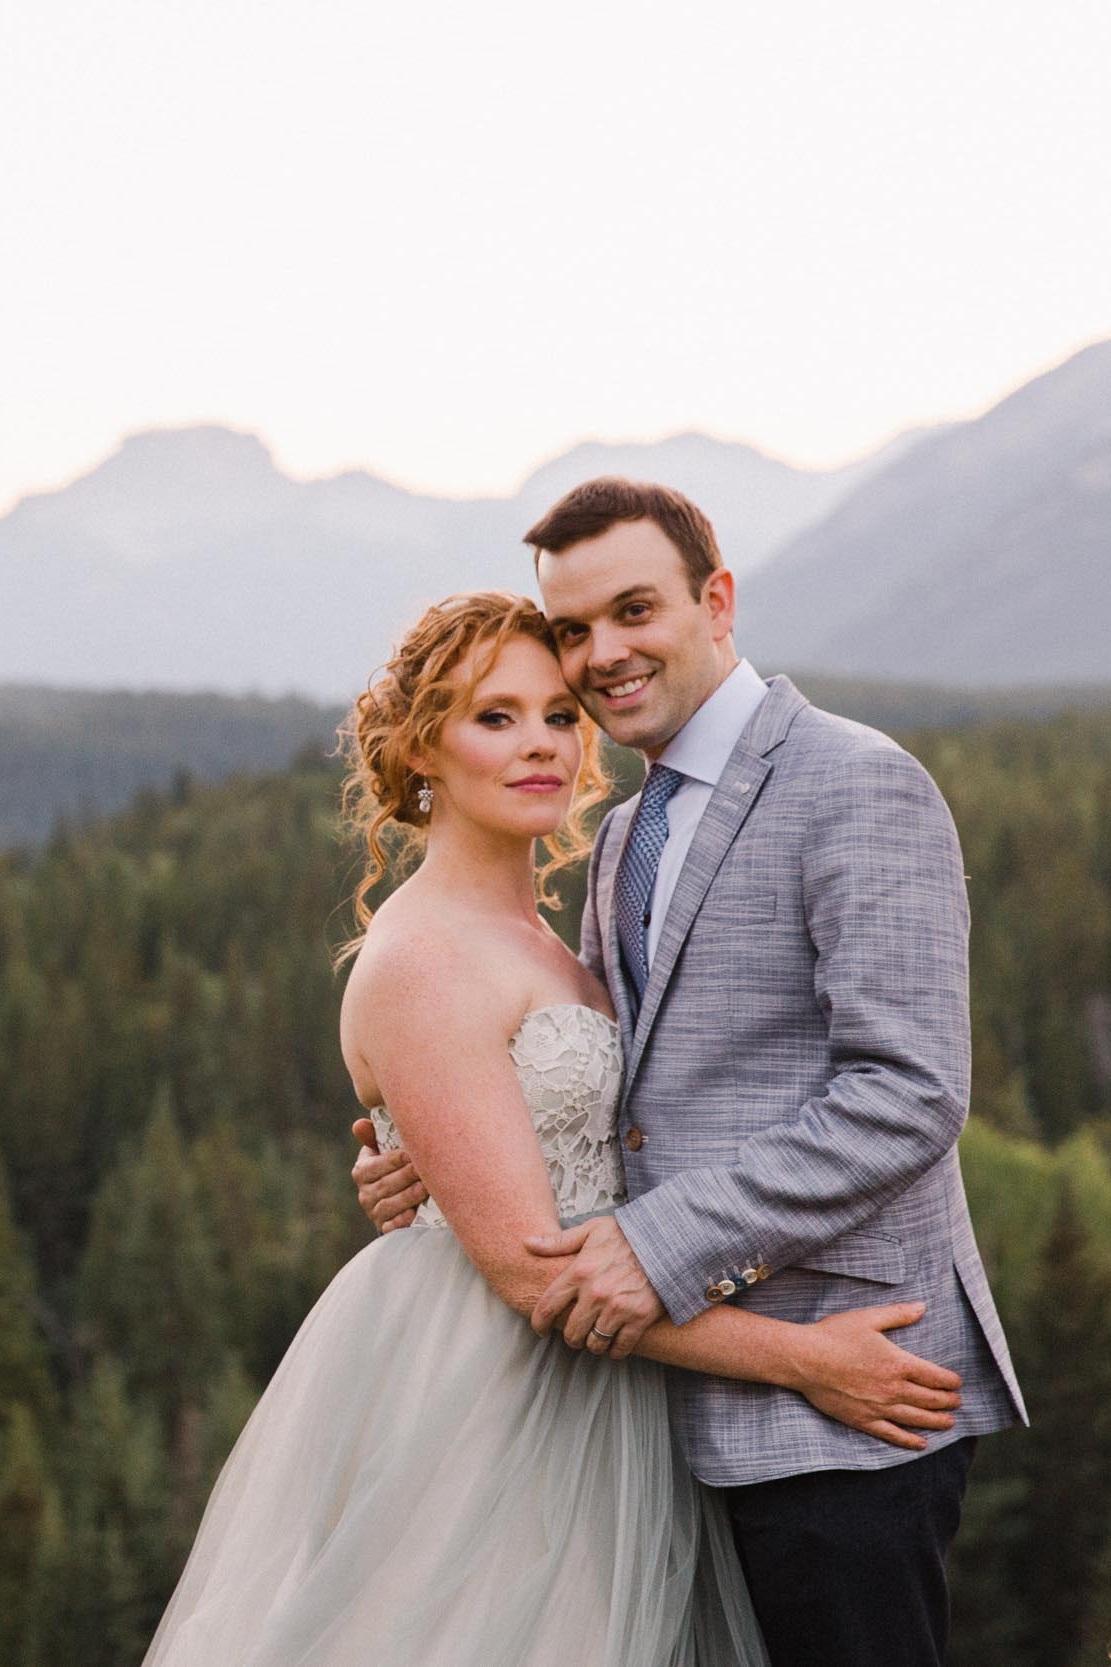 Banff+Wedding+Engagement+Vow+Renewal++Photographer+Jennie+Guenard+Photography-44.jpg